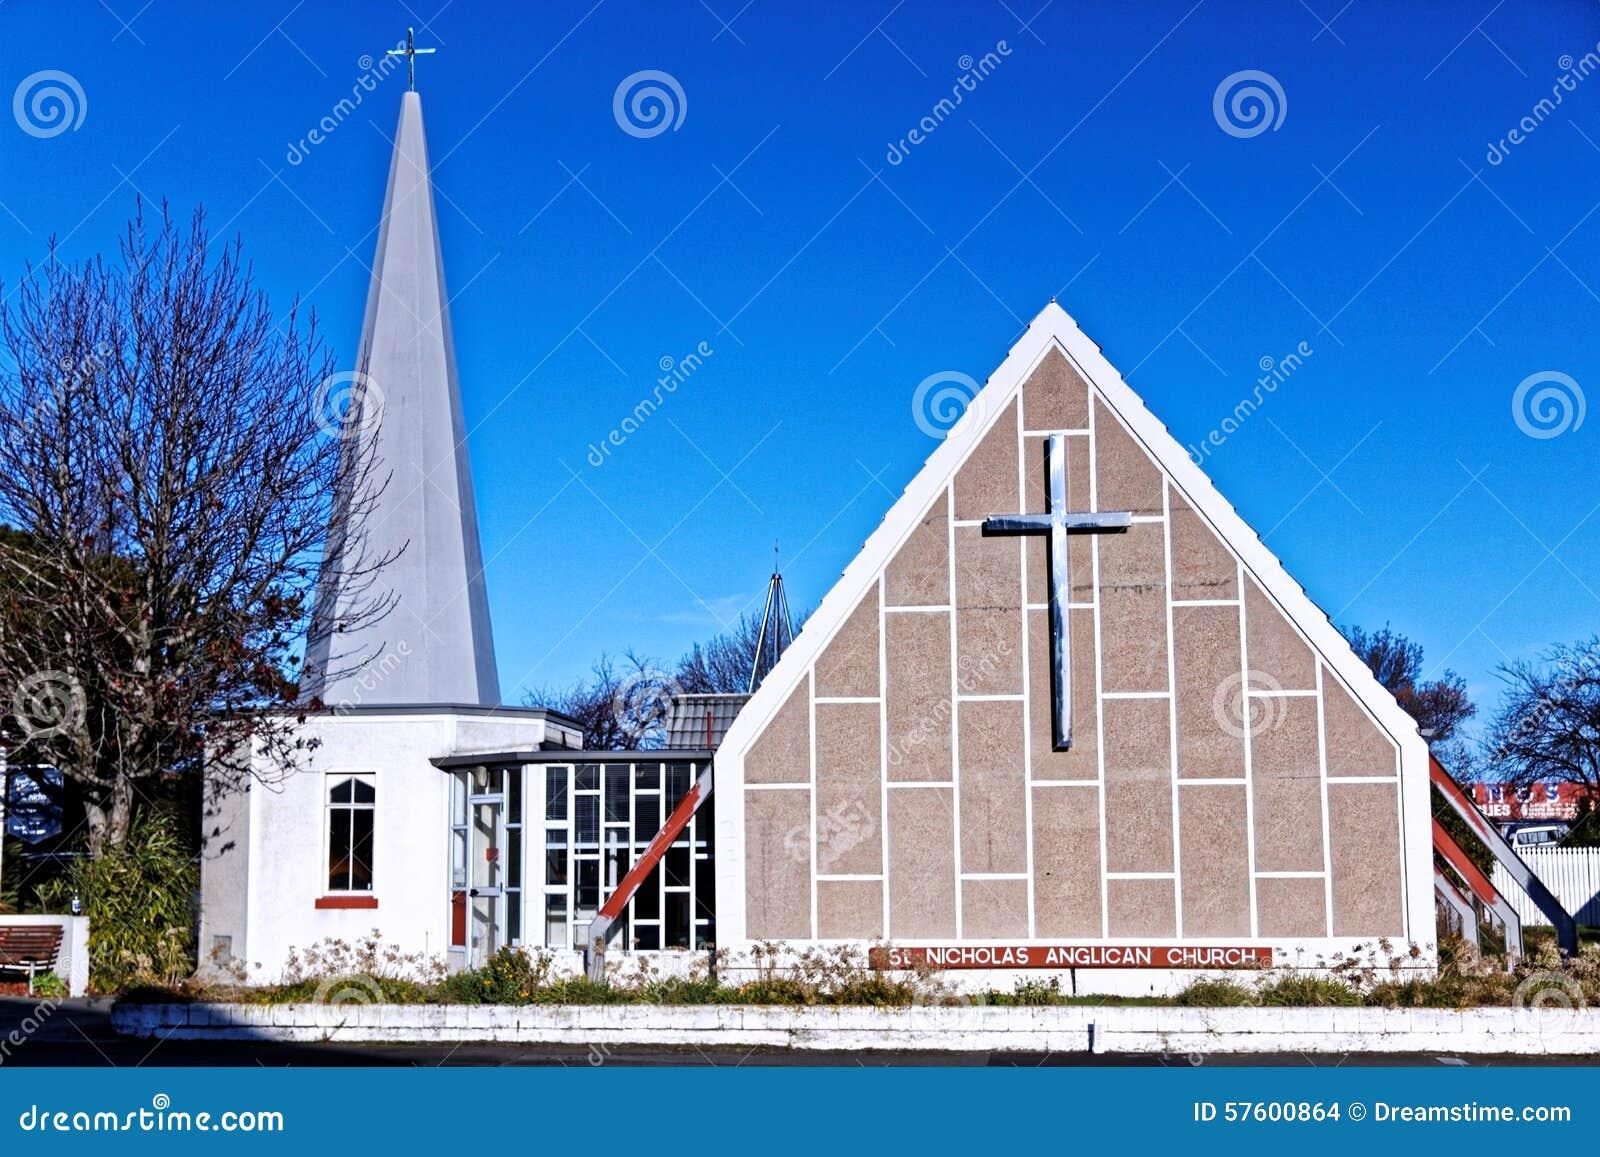 Anglican Church, Christchurch New Zealand Stock Photo